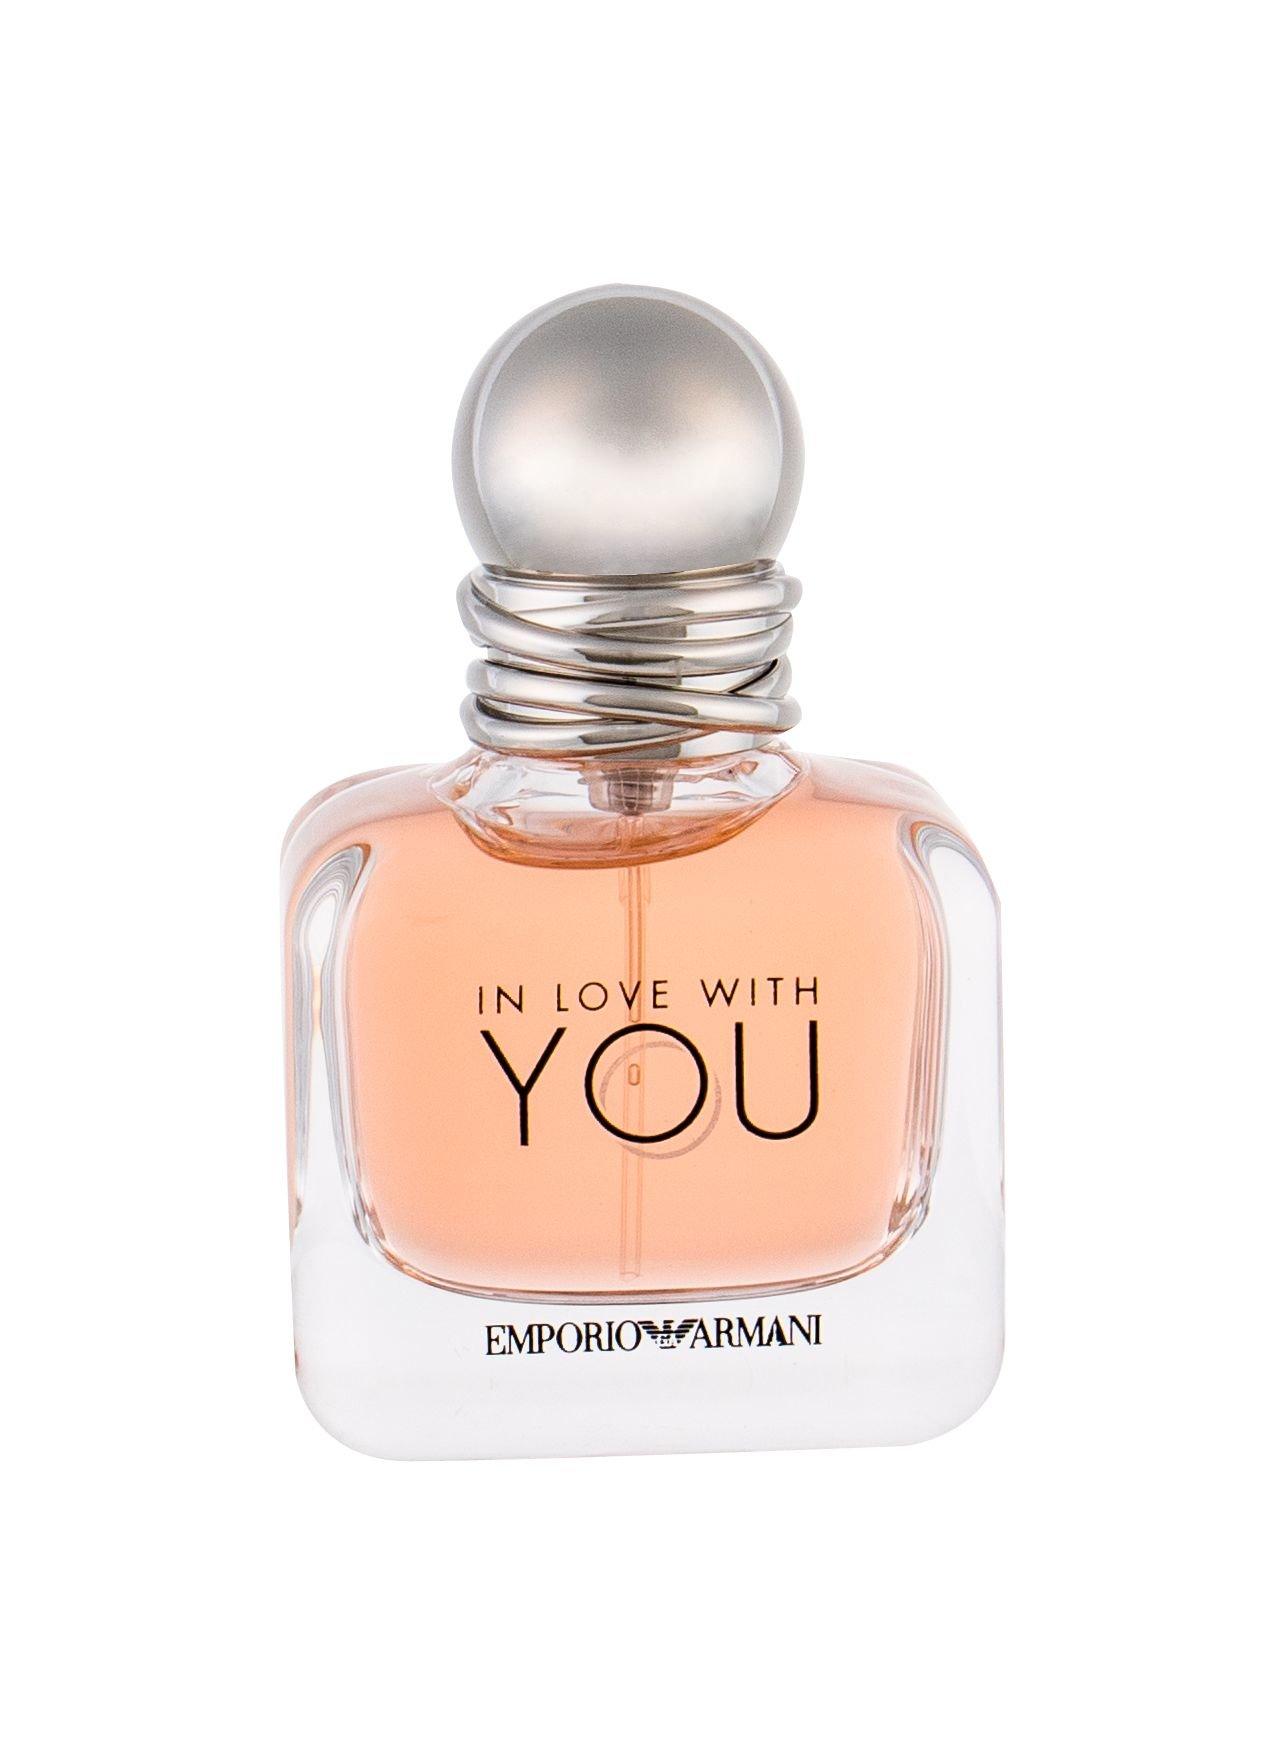 Giorgio Armani Emporio Armani Eau de Parfum 30ml